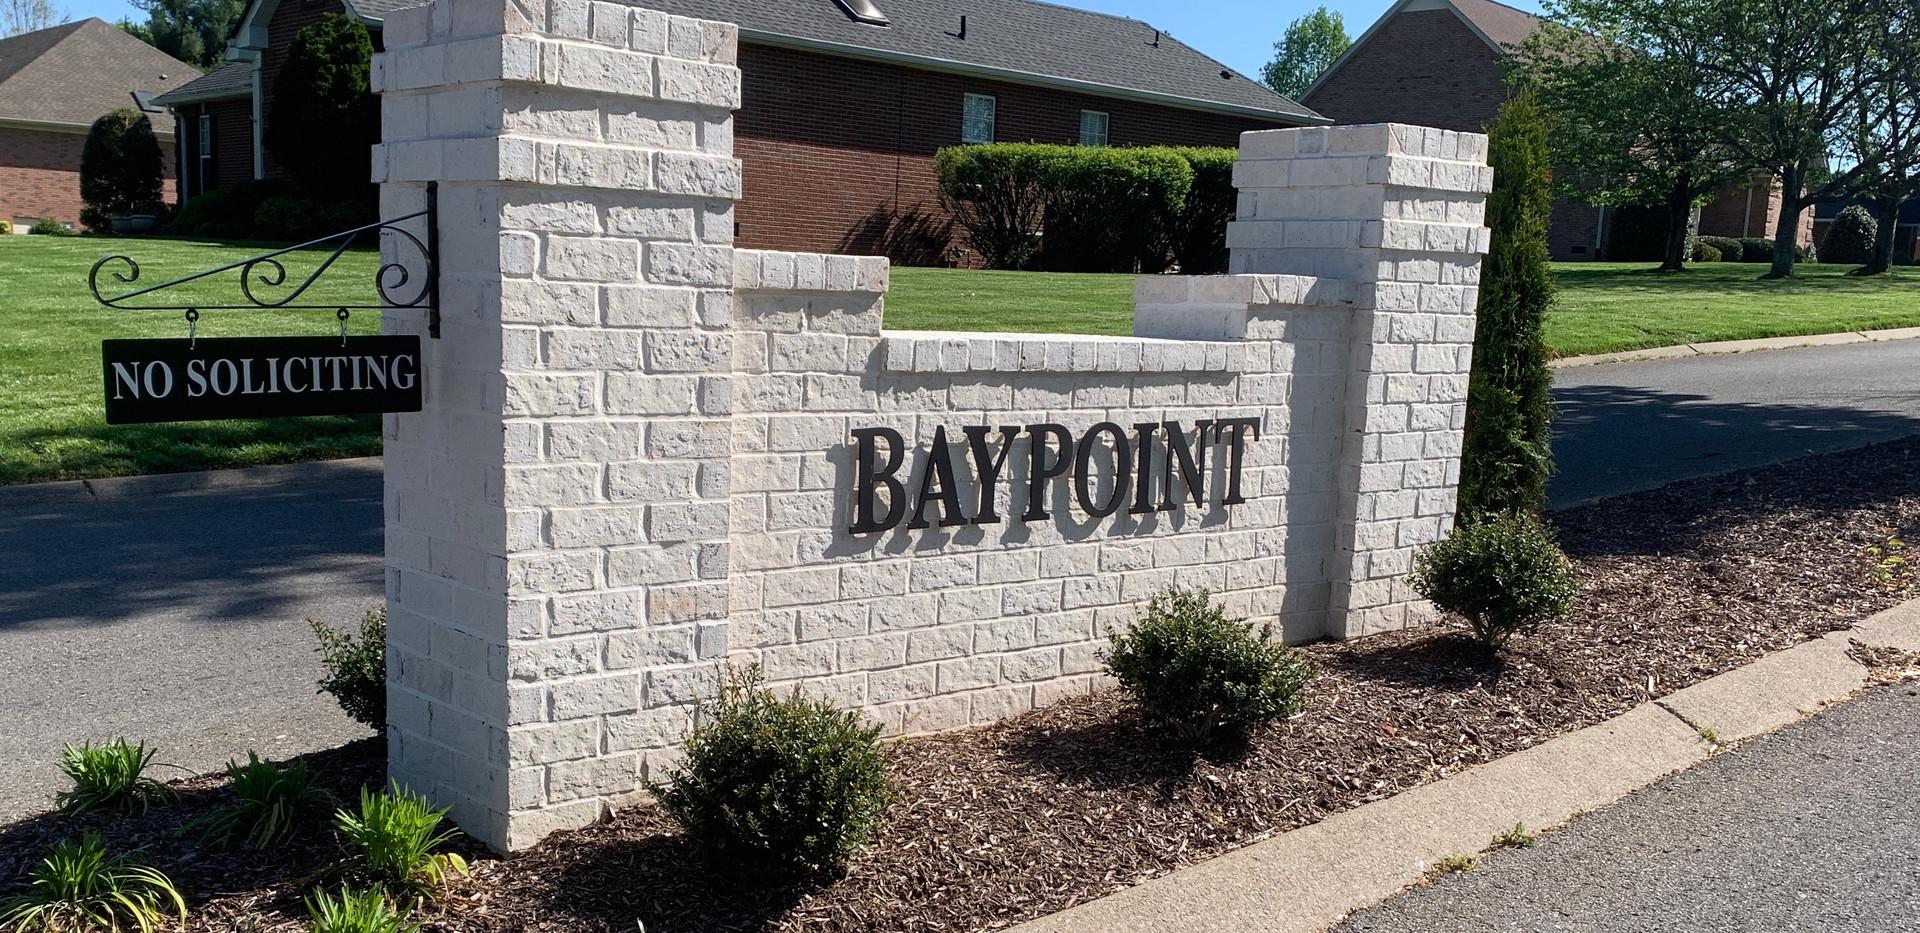 Baypoint - Aluminum Cut Letters, TN